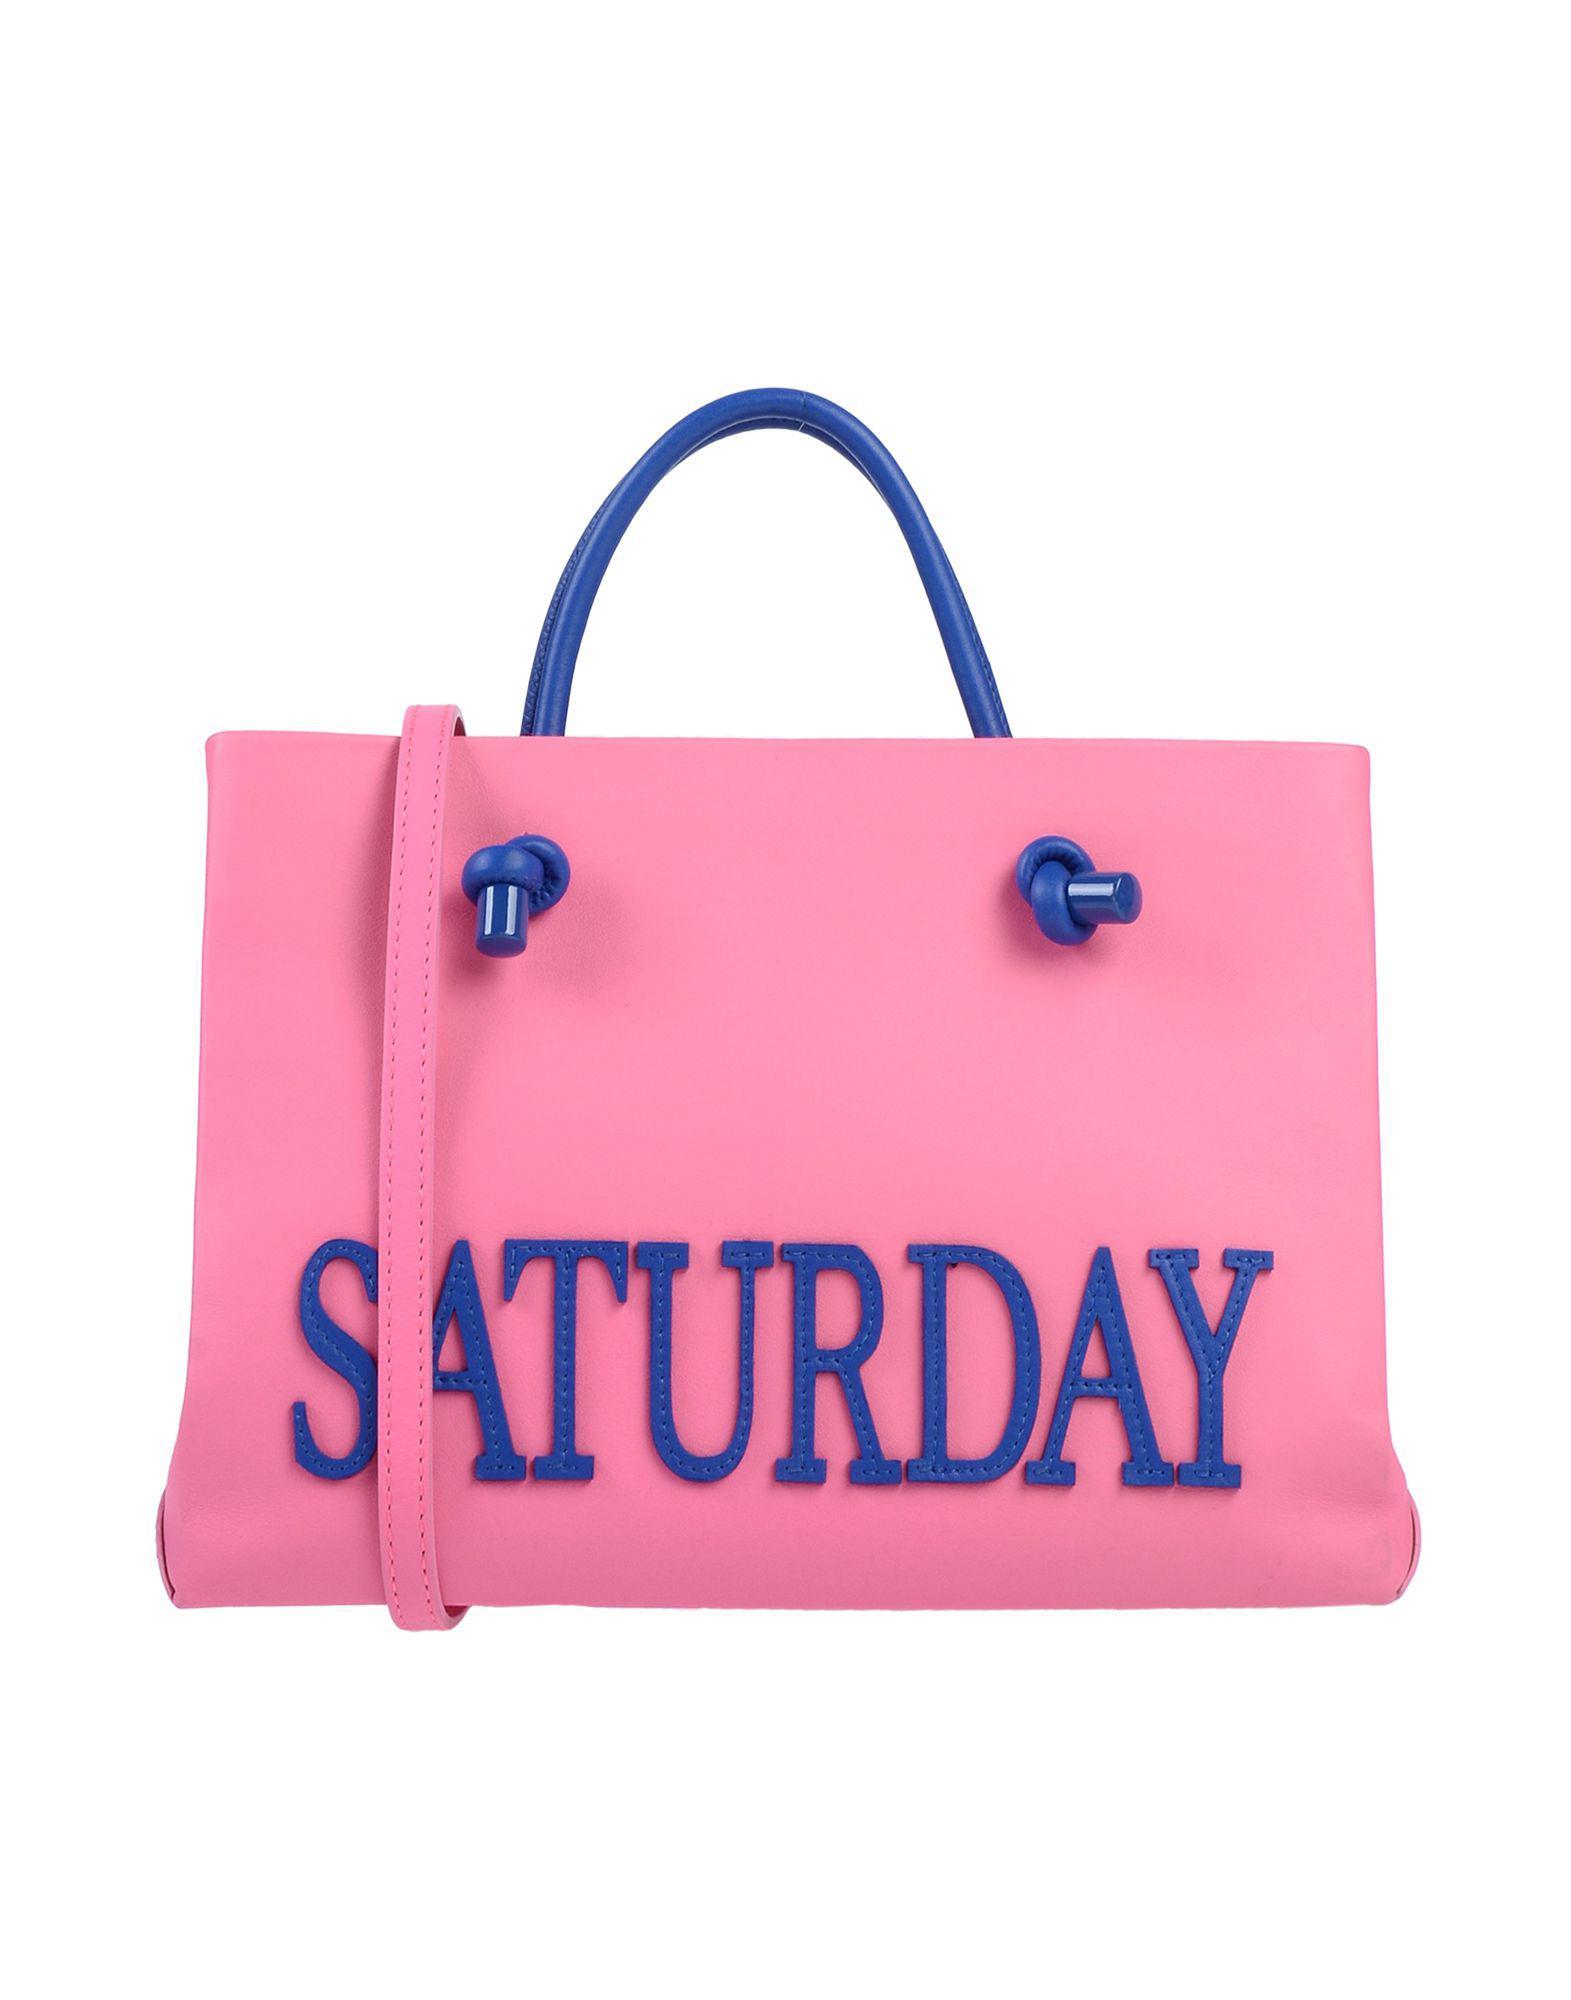 577fdcfb5ee6 Alberta Ferretti Handbag in Pink - Save 49% - Lyst